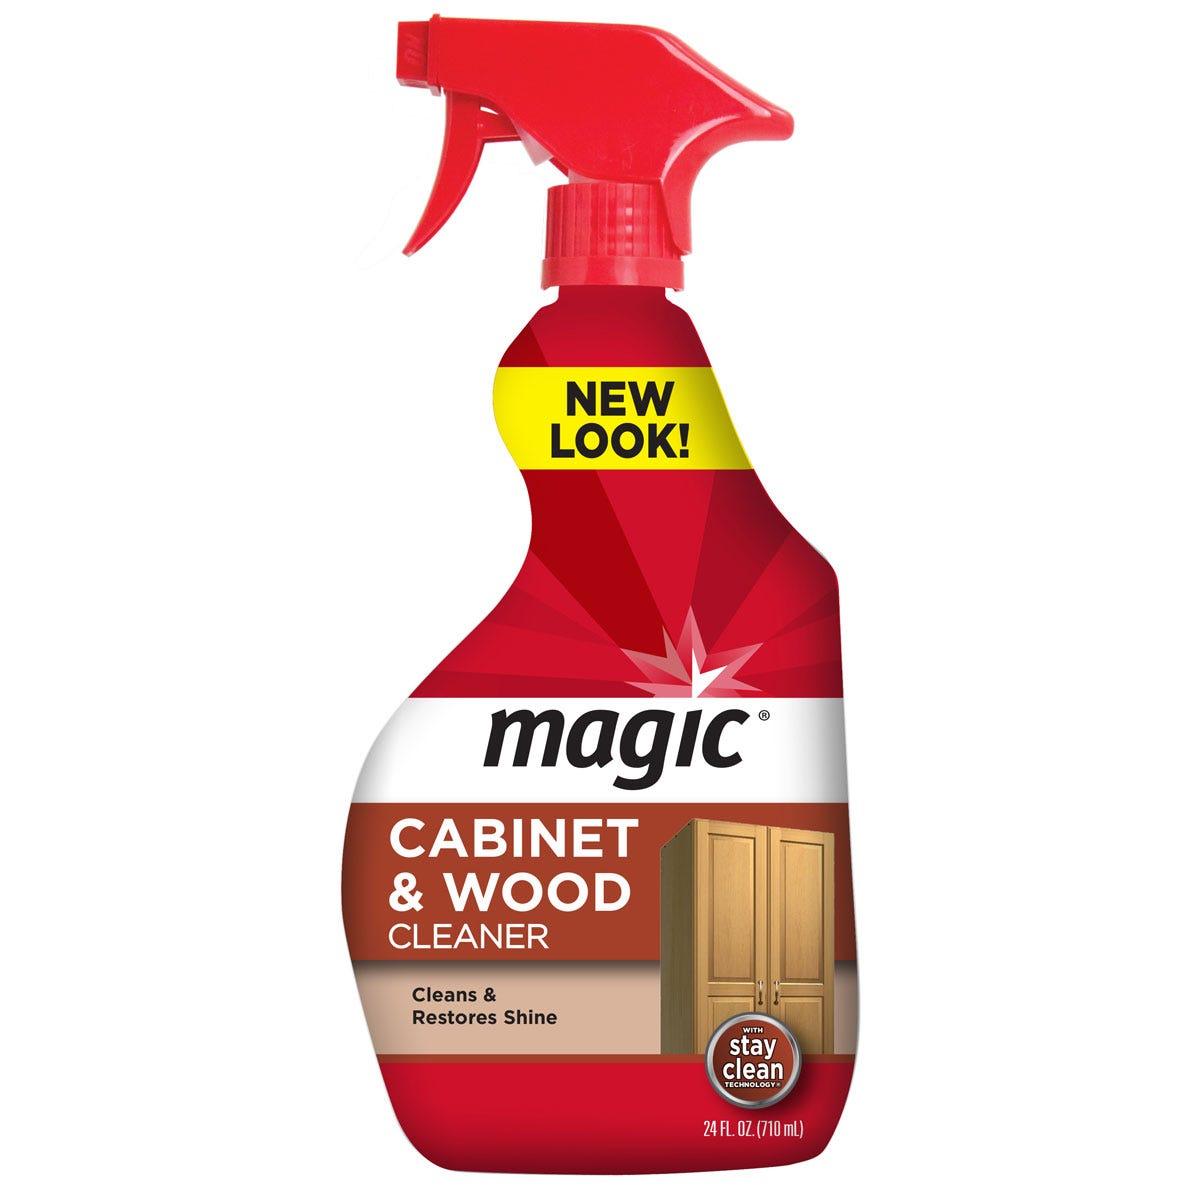 https://googone.com/media/catalog/product/m/a/magic-cabinet-cleaner-spray_front.jpg